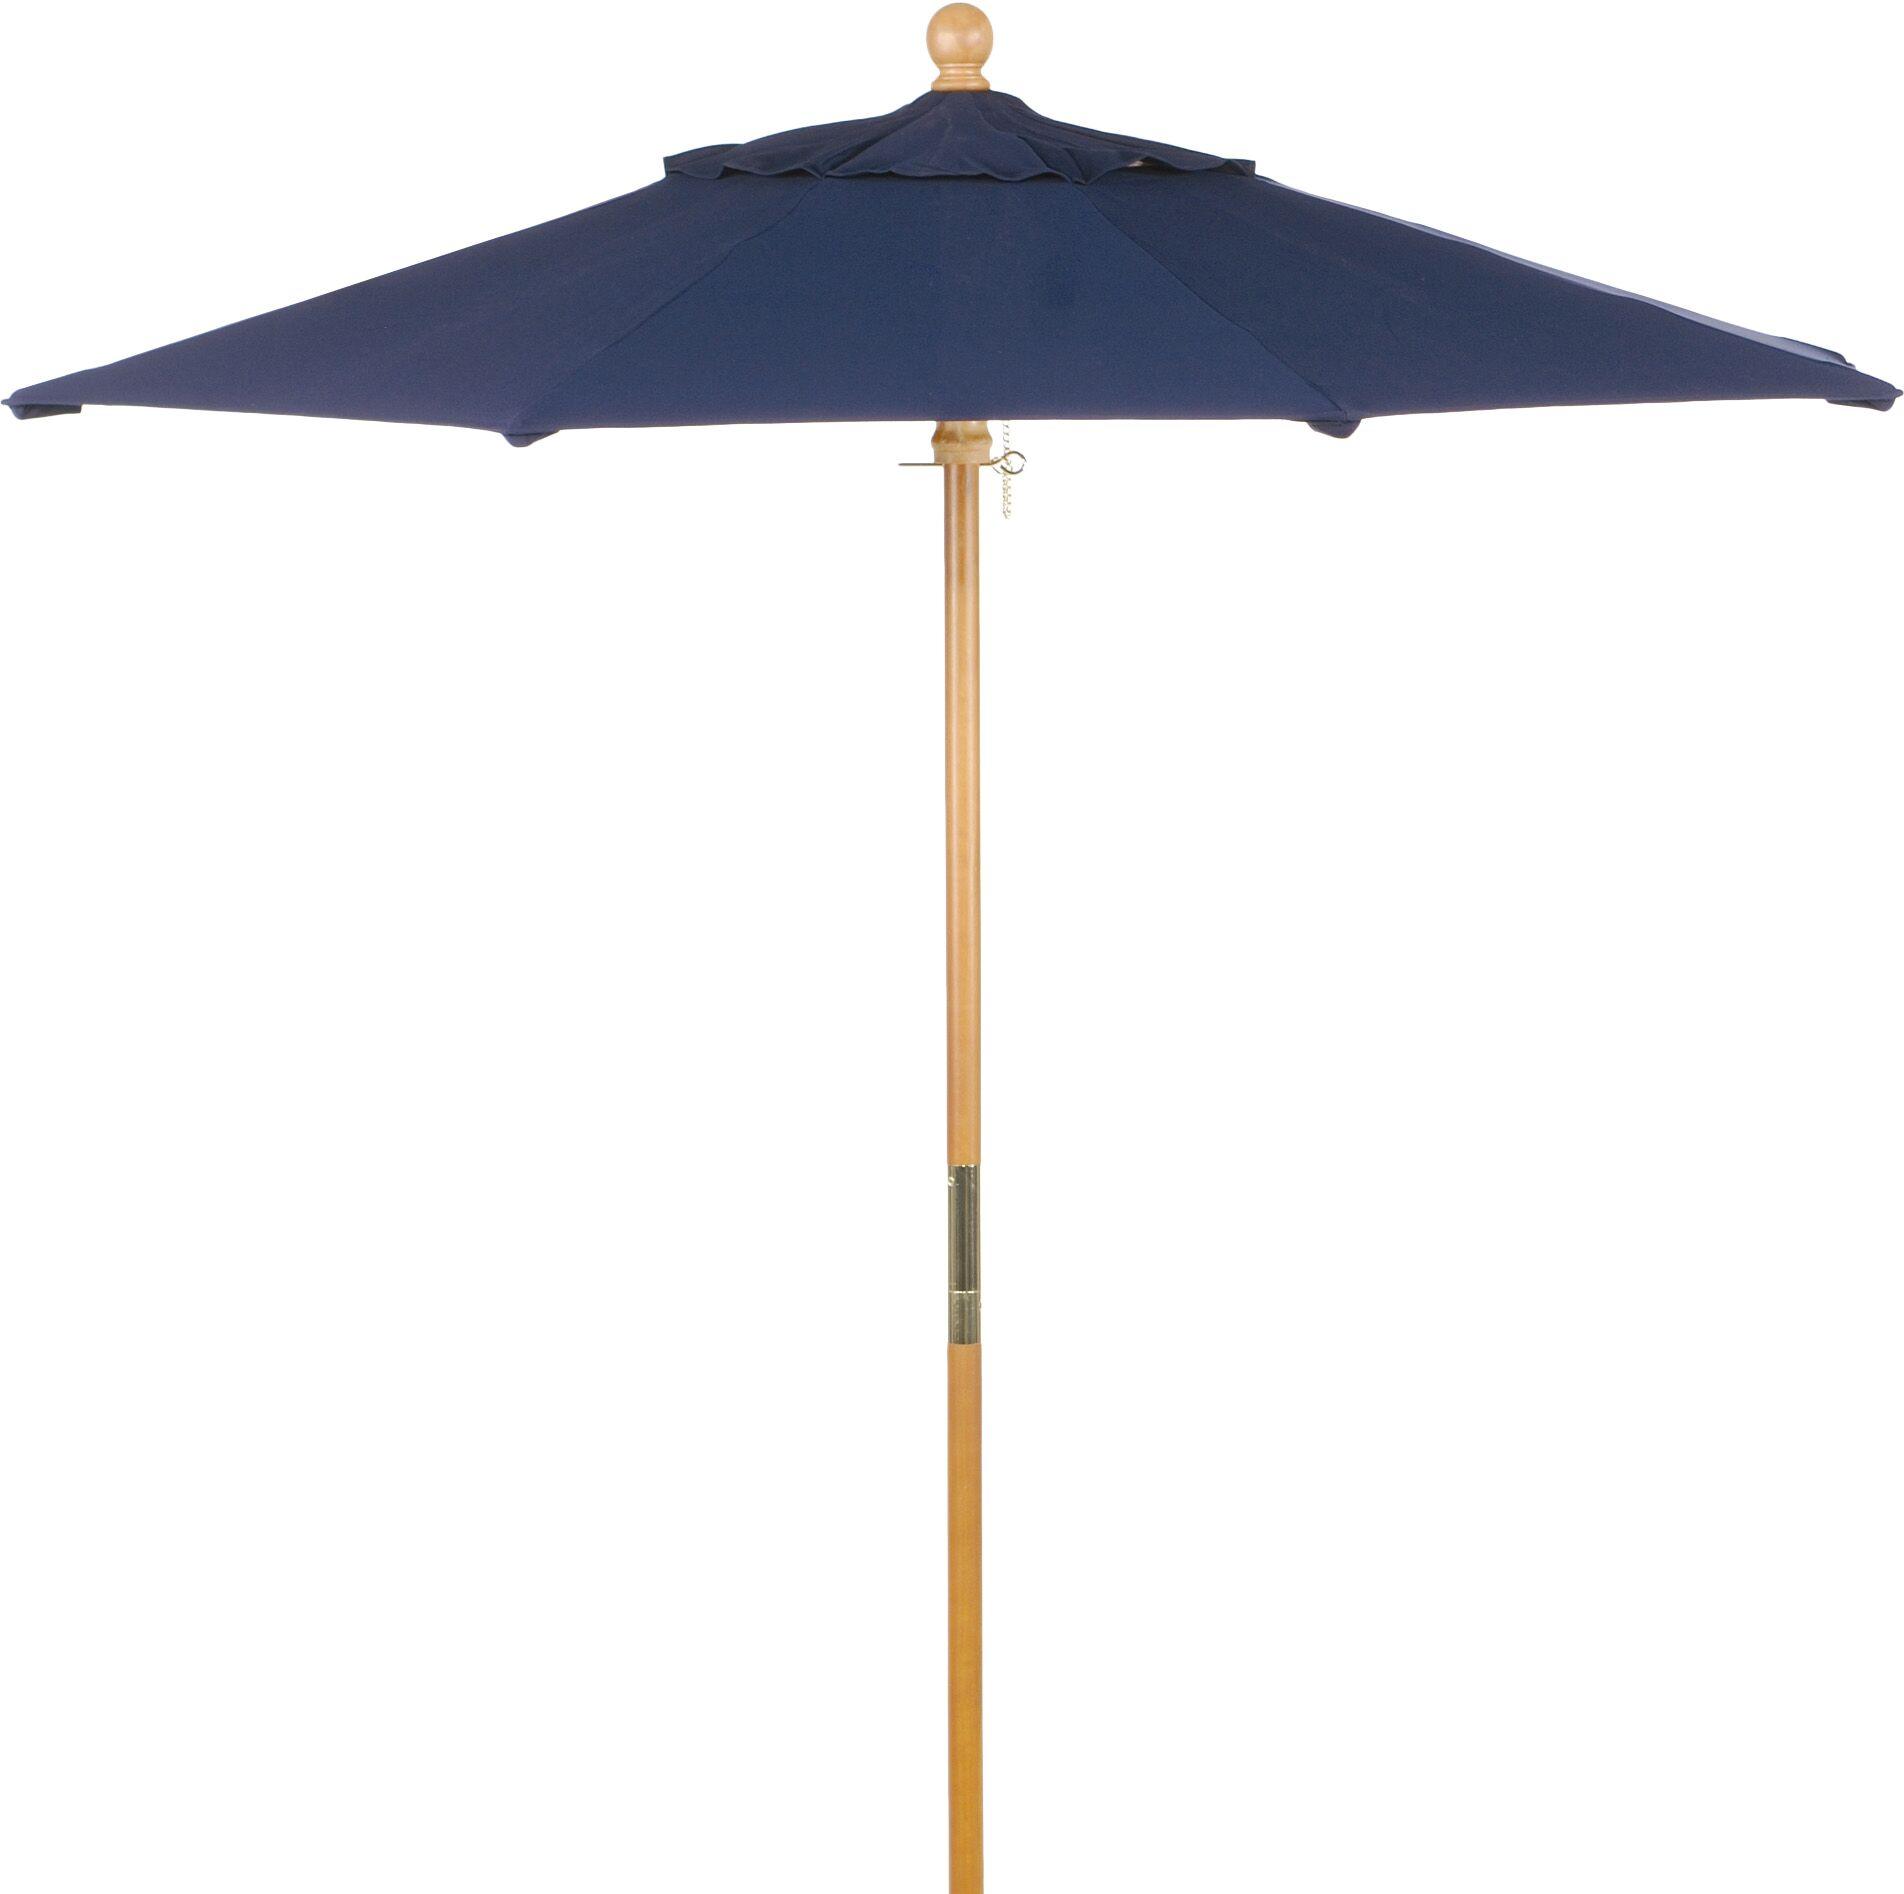 Starcher 6' Market Umbrella Fabric: Navy